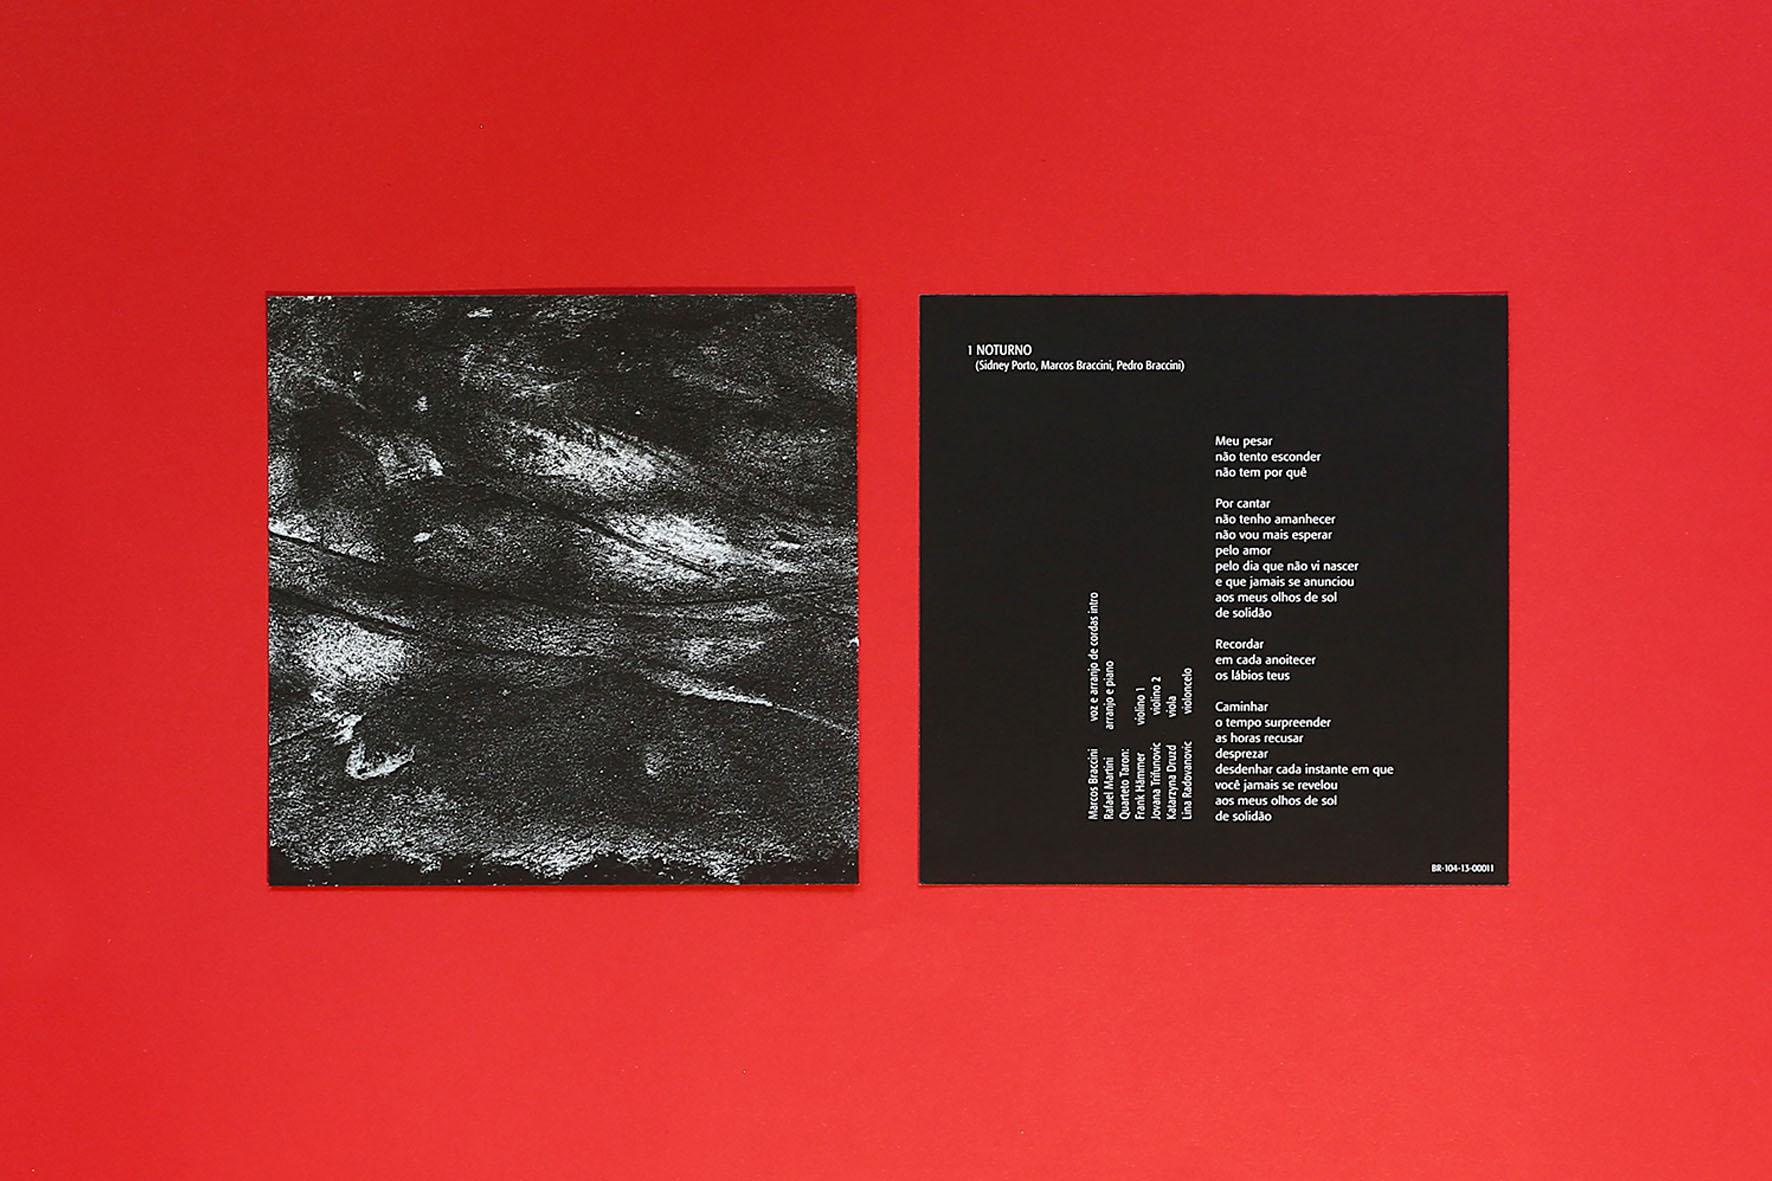 Noturno-Daniel-Cavalcanti-ficha-2